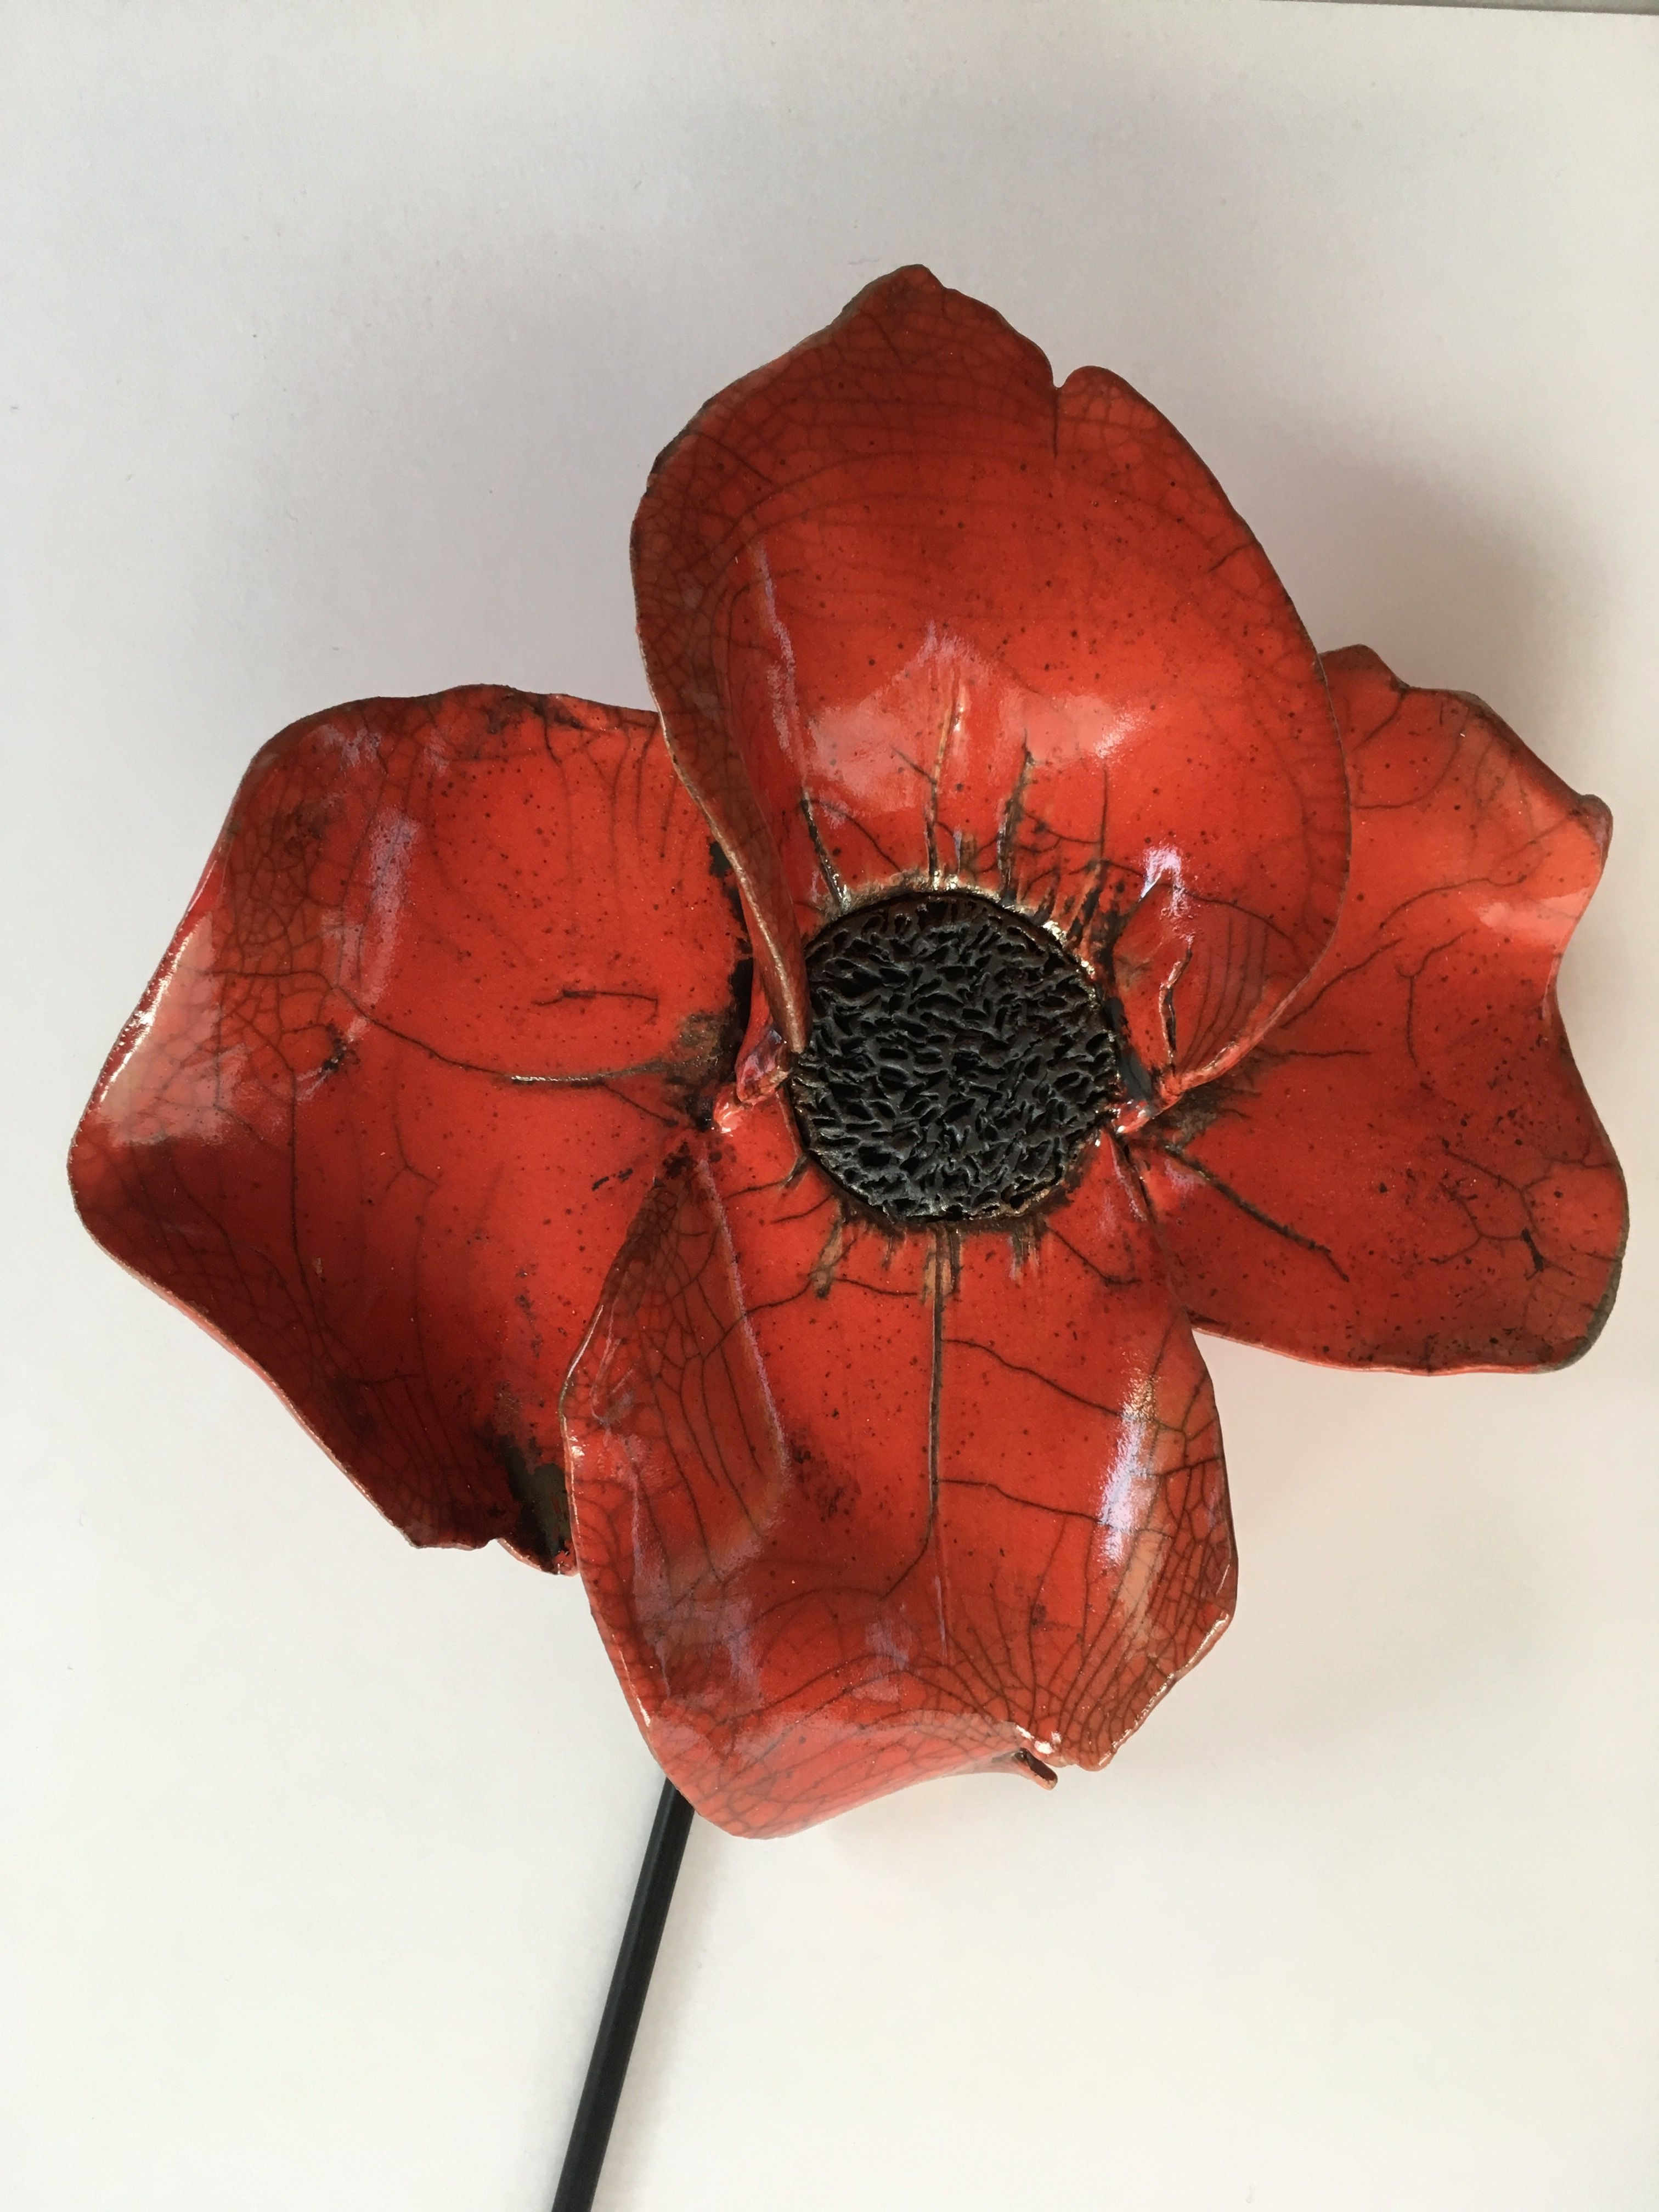 Coquelicot Raku Rouge 1050 Sur Terre Rose De Saint Aubin Mon Atelier Raku Sur Facebook Mohnblume Mohn Keramik